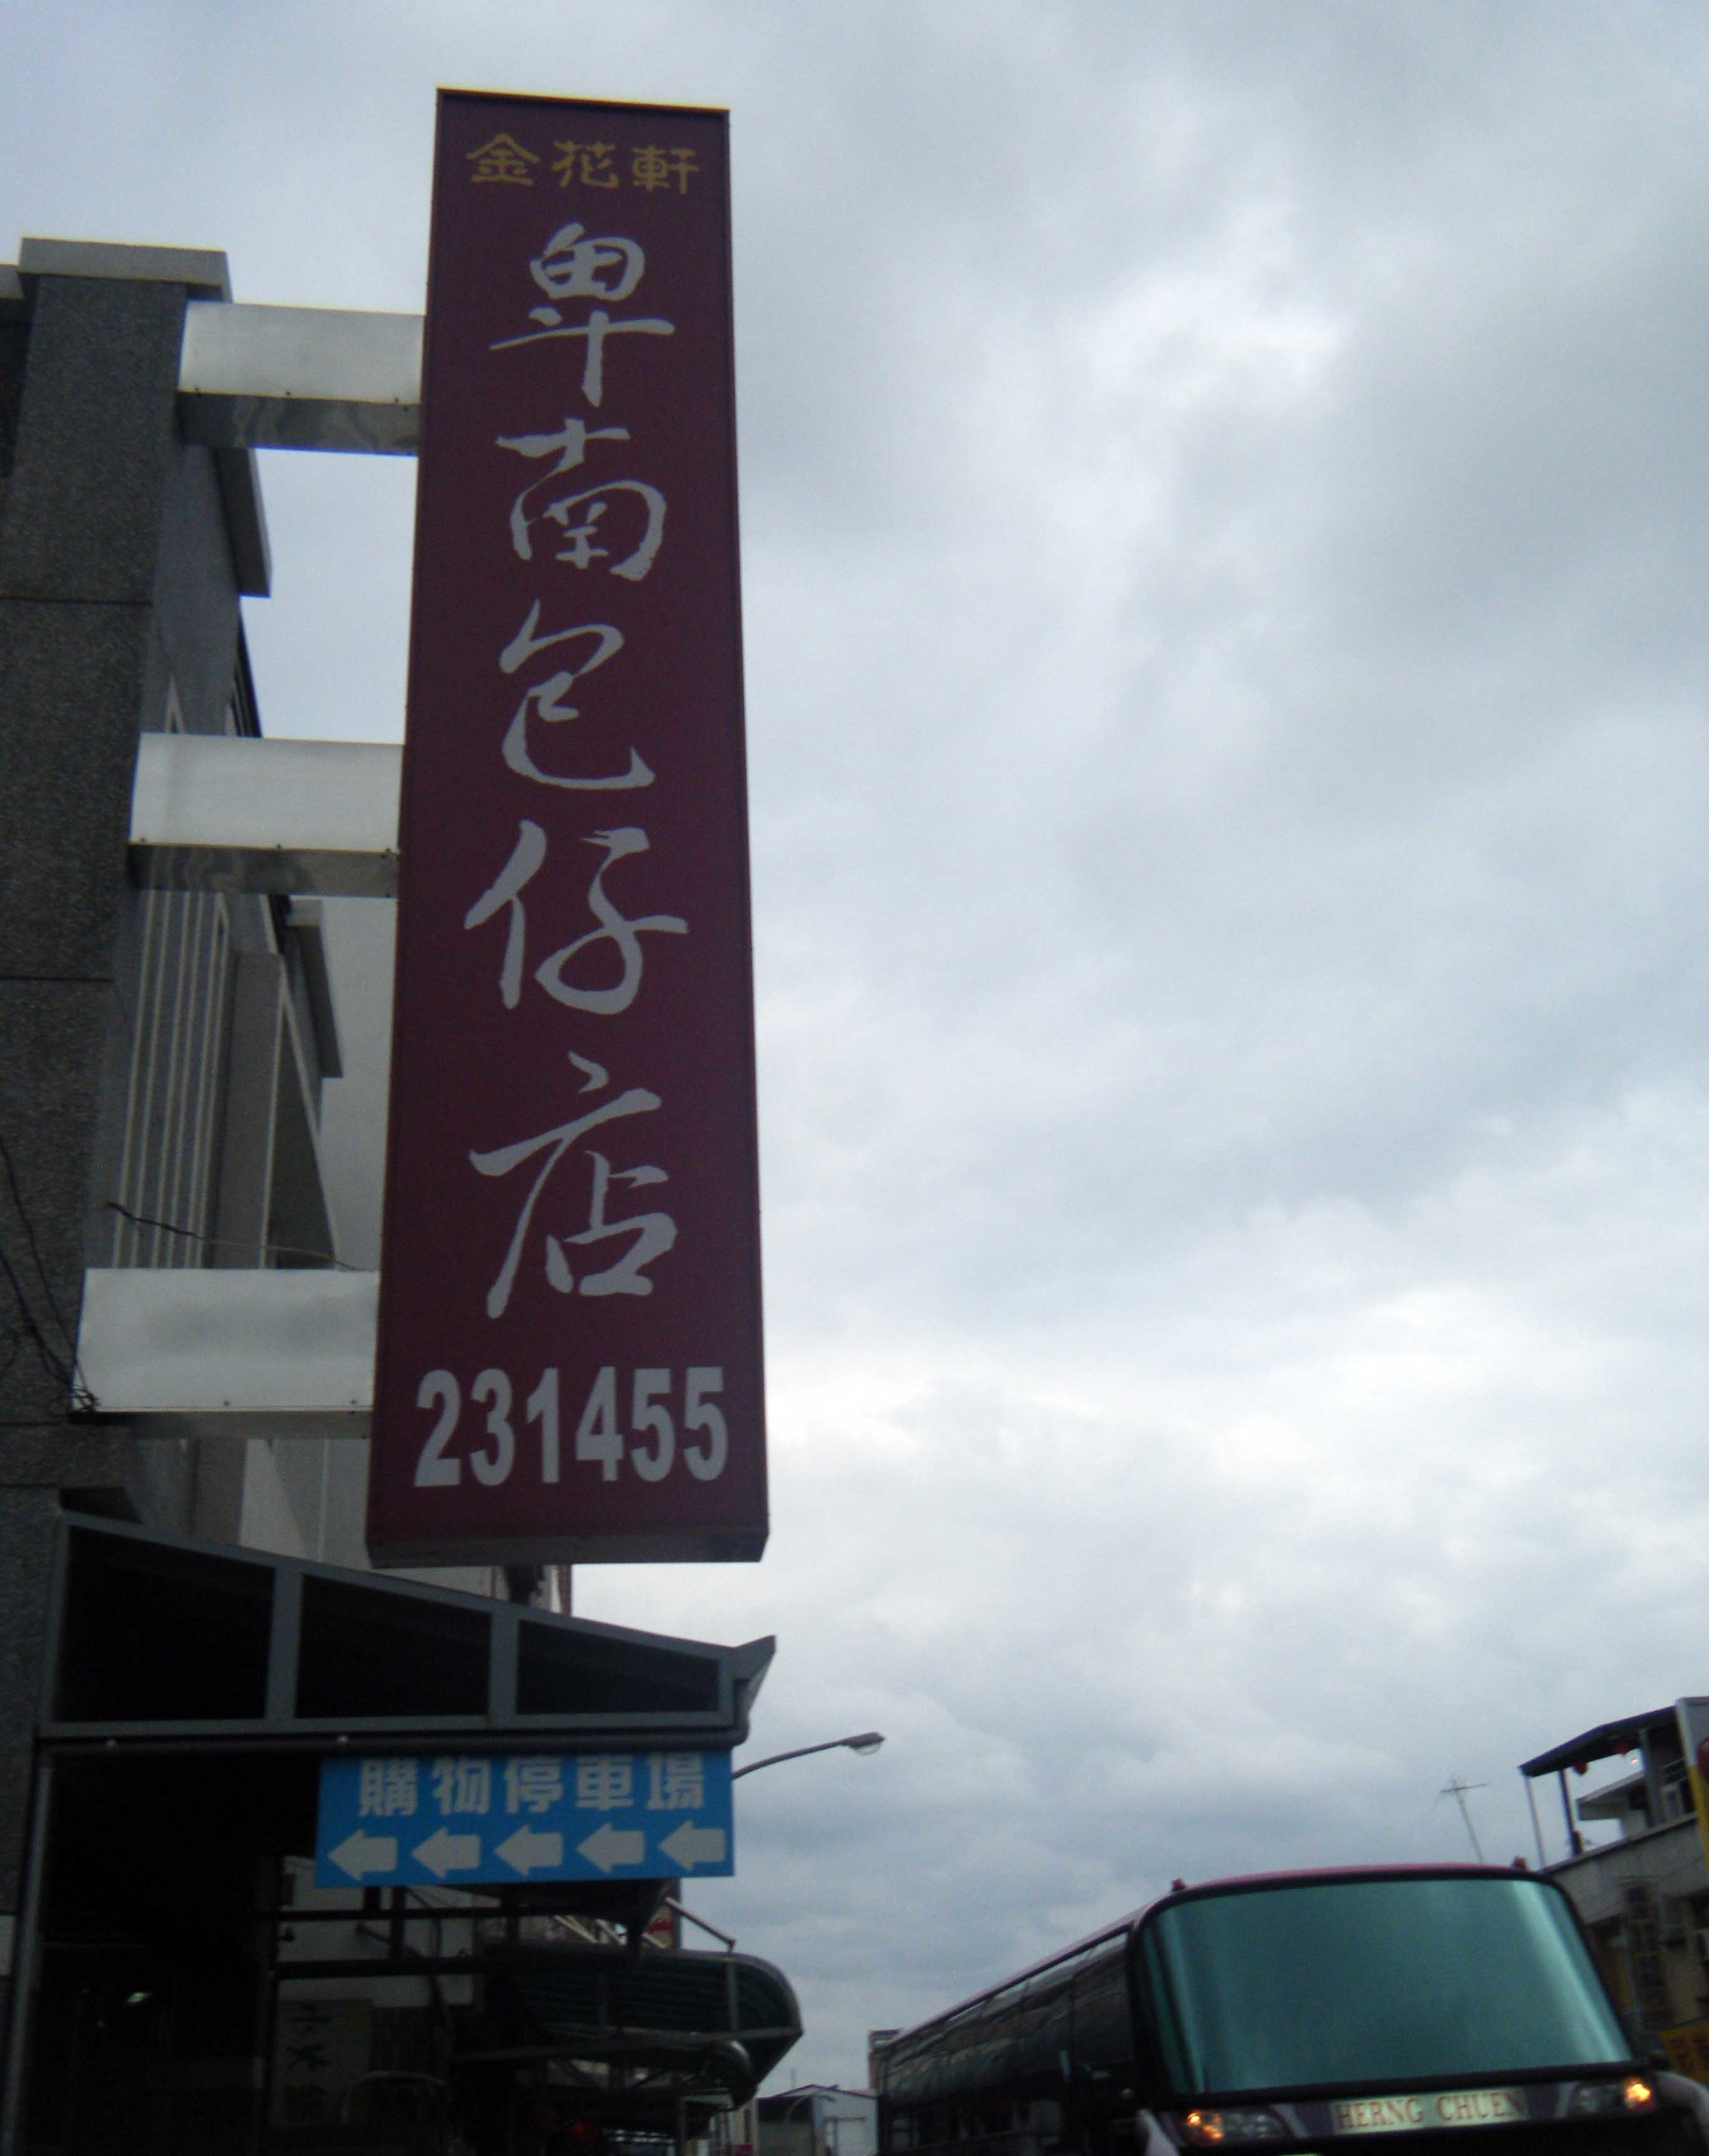 Incredible bao-dze place.jpg